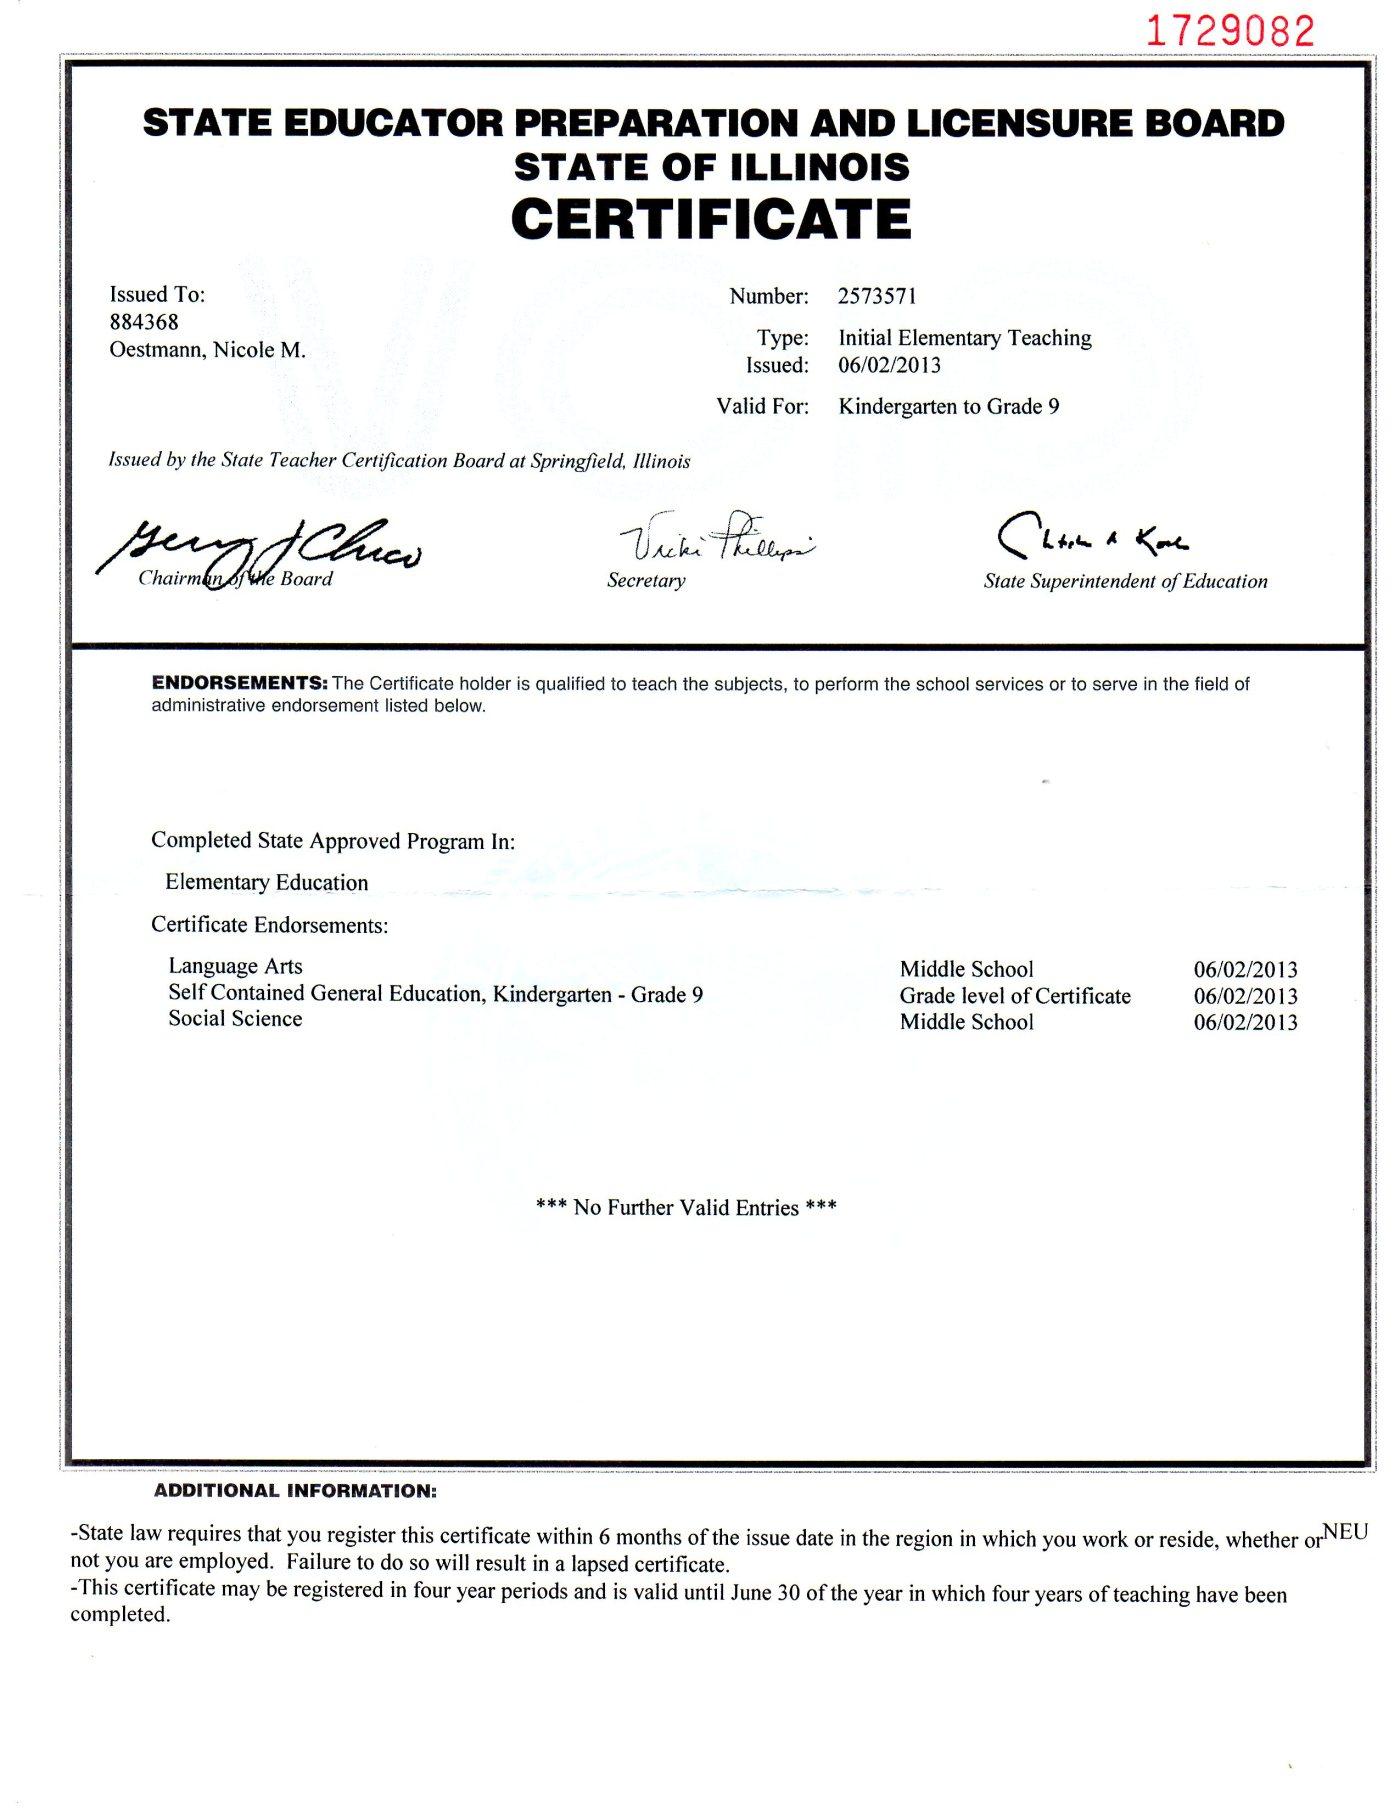 Illinois Teaching Certificate Nicole M Oestmann